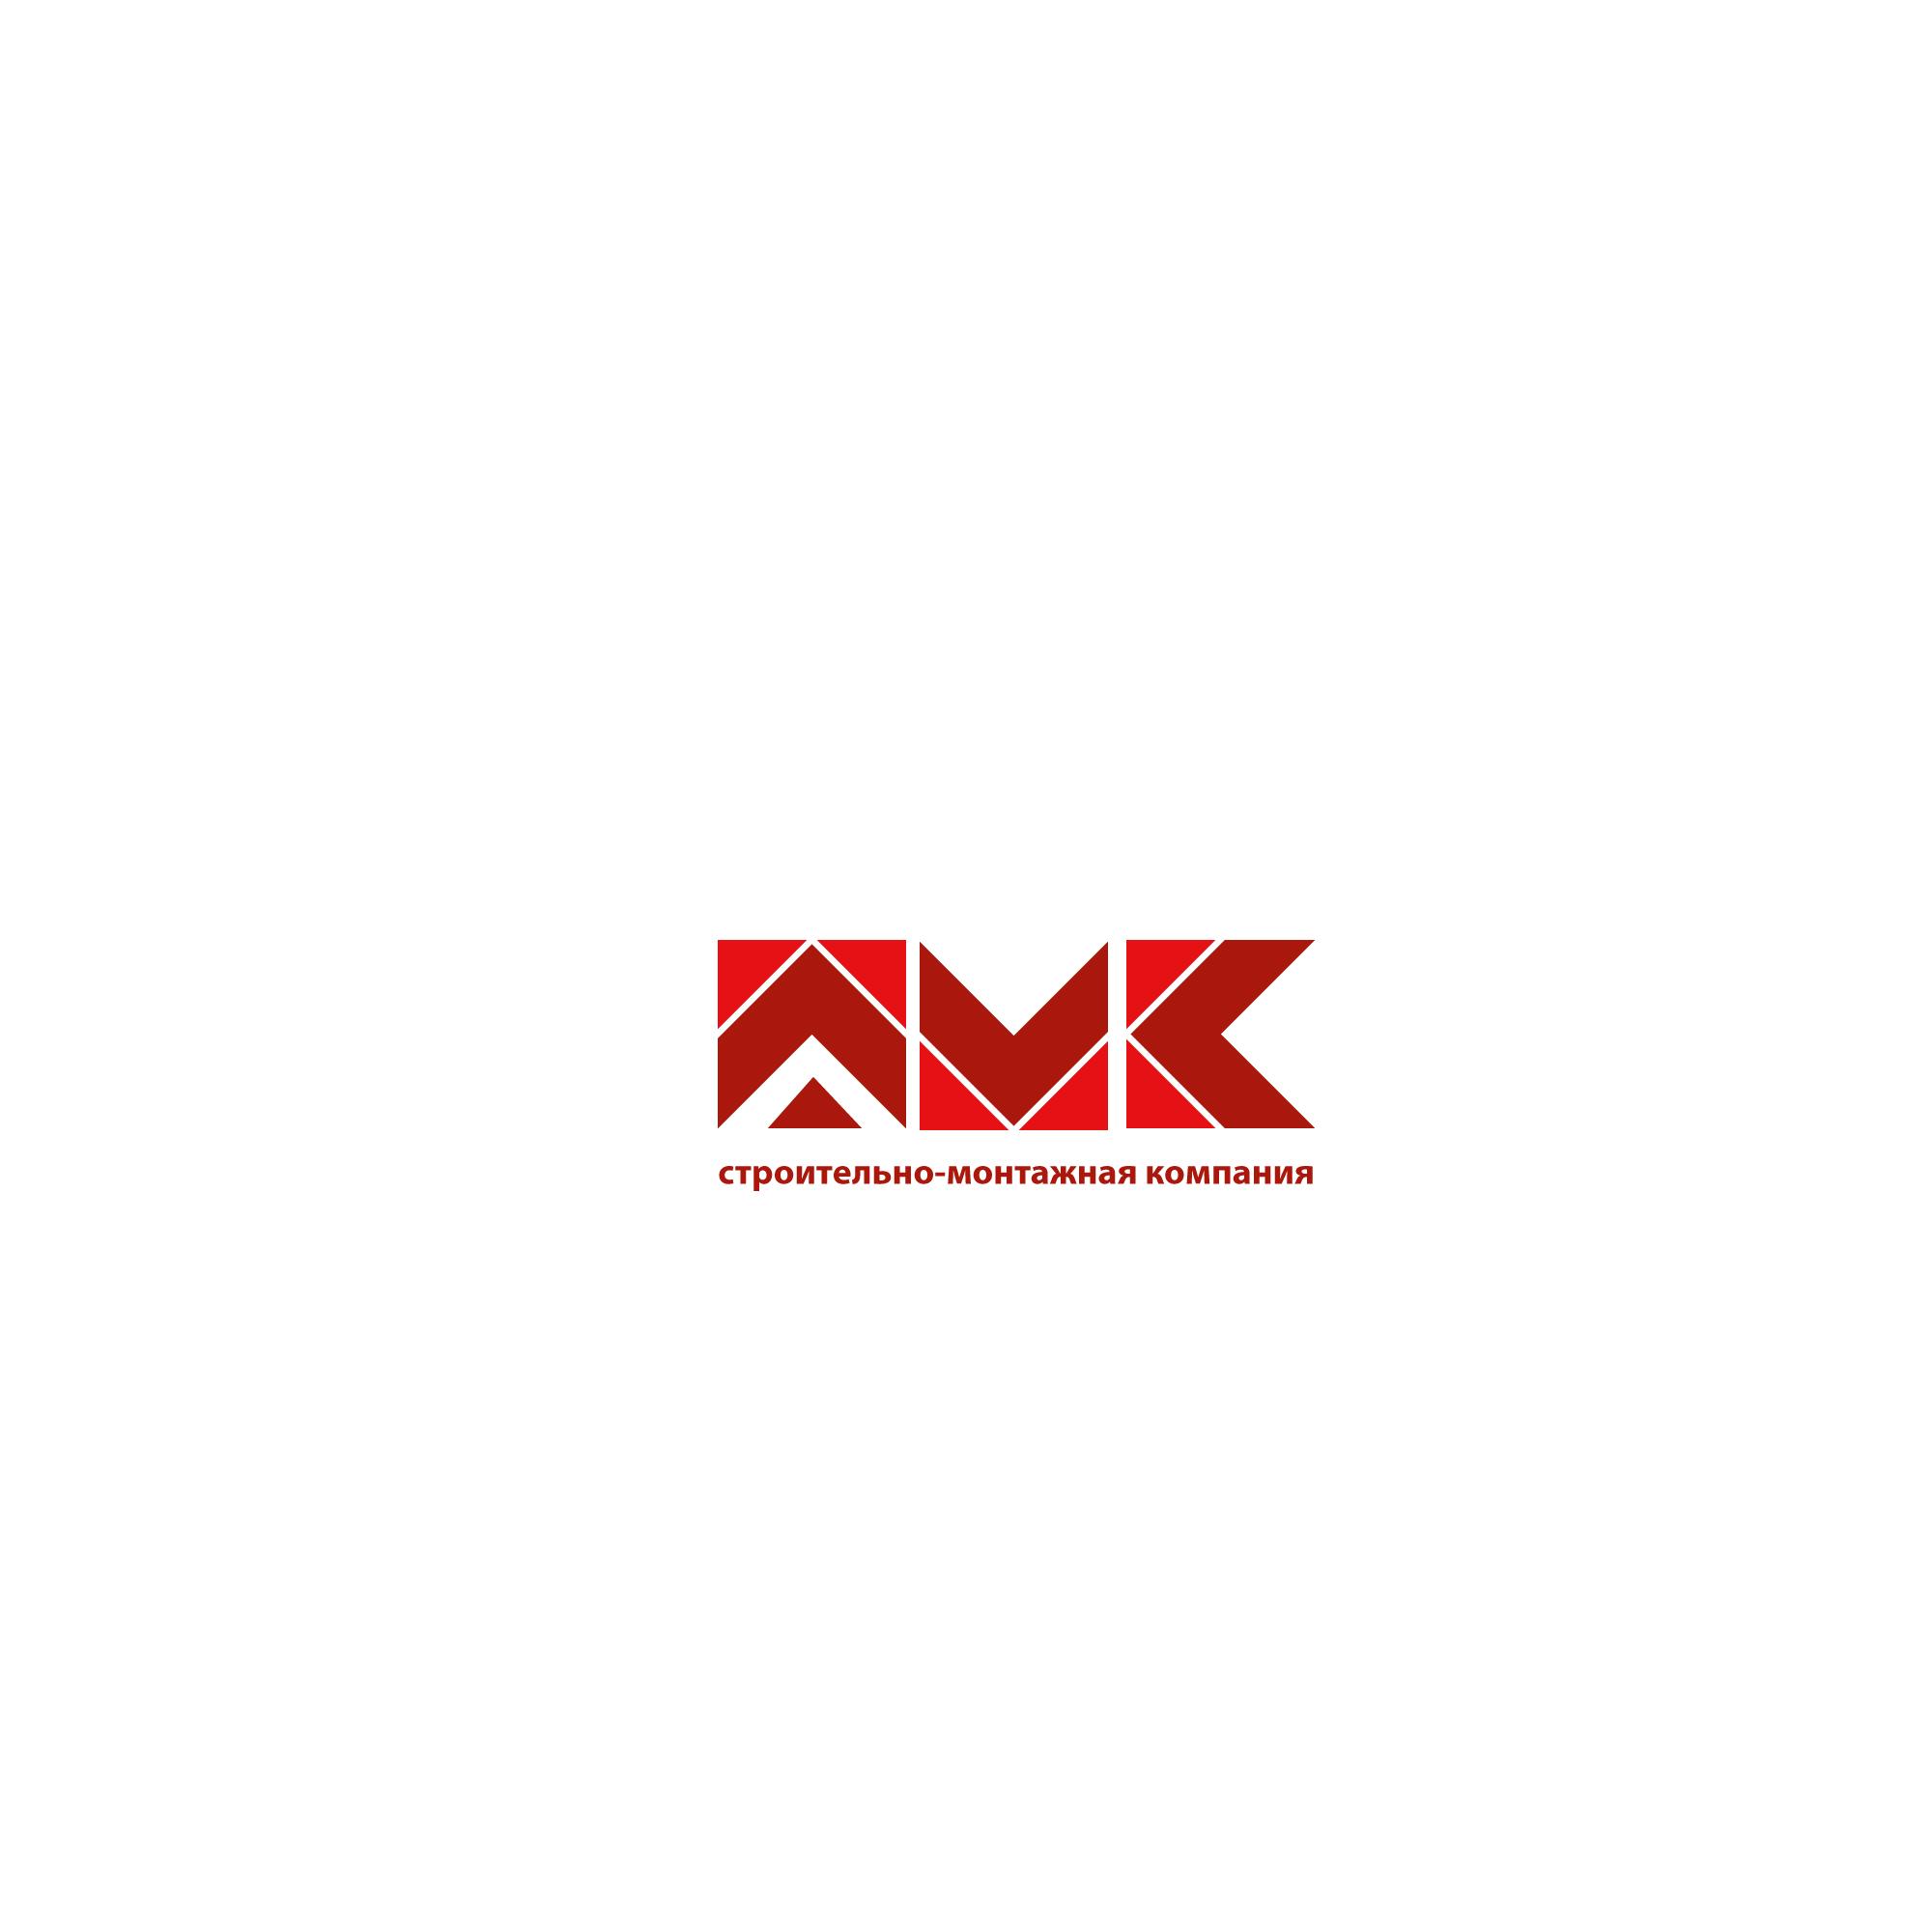 Разработка логотипа компании фото f_3885dcd6f2df2865.jpg